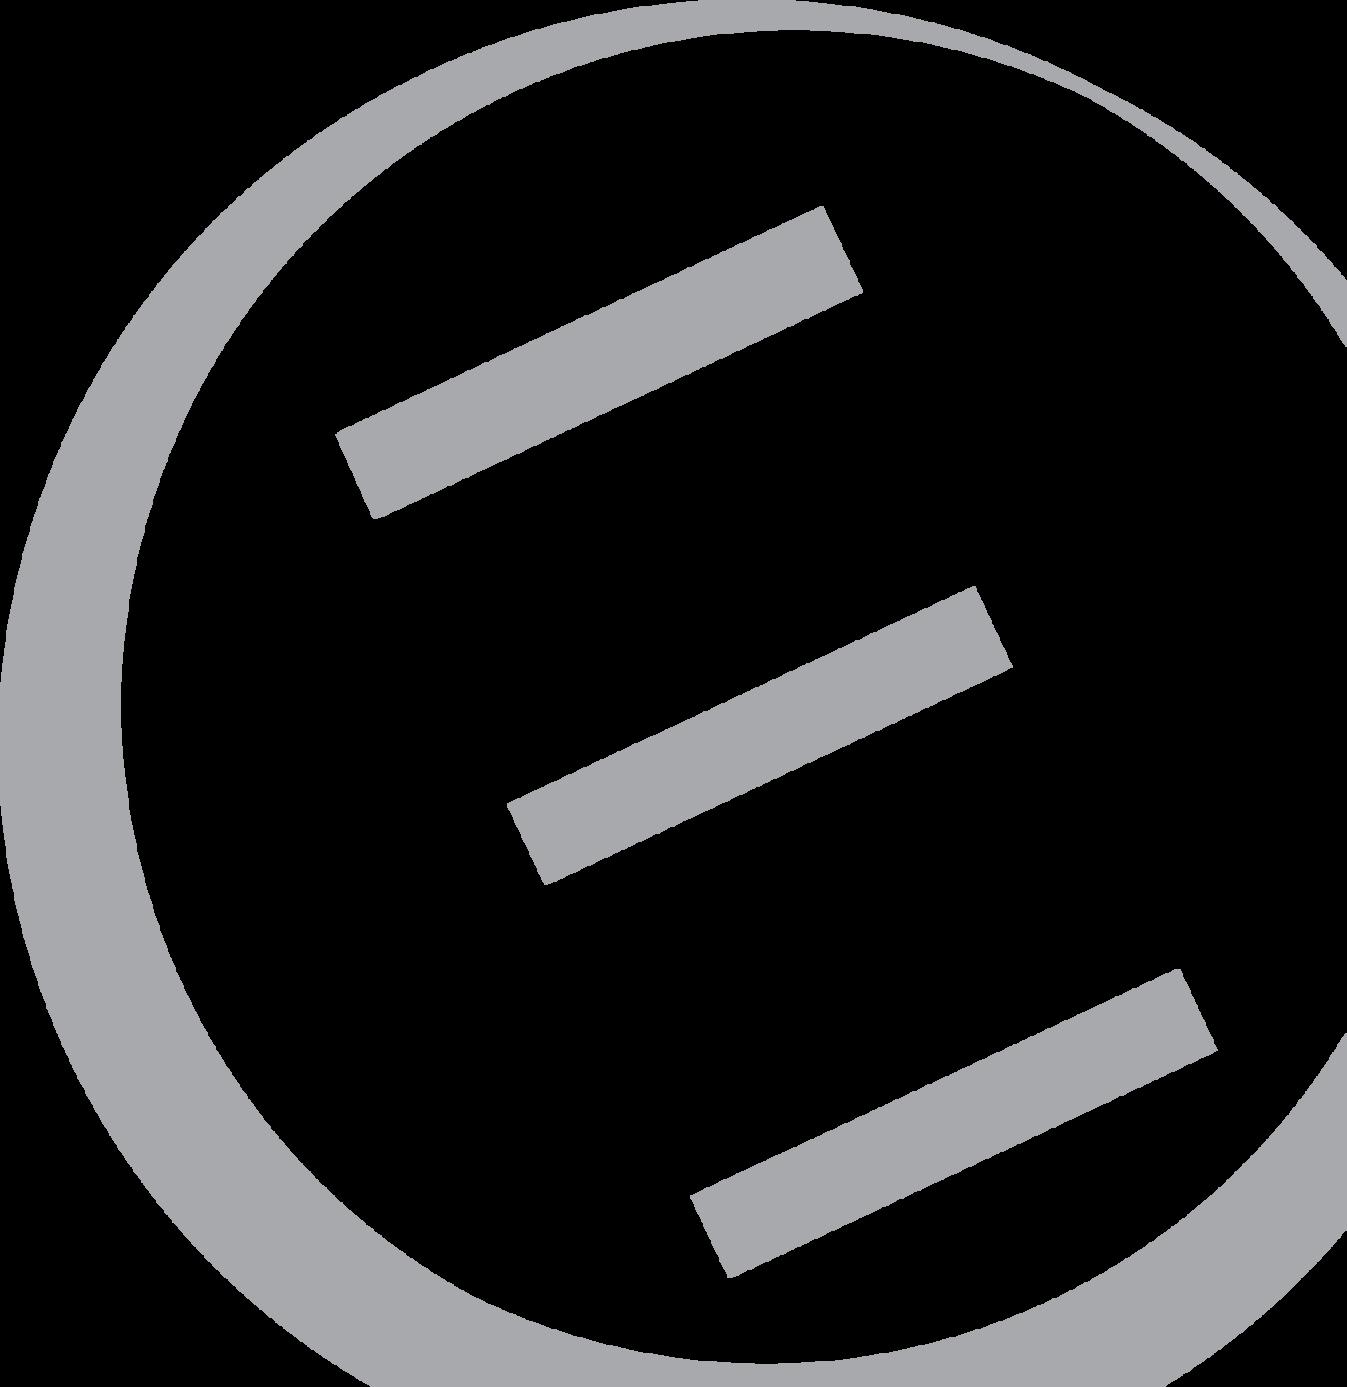 Logo Watermark